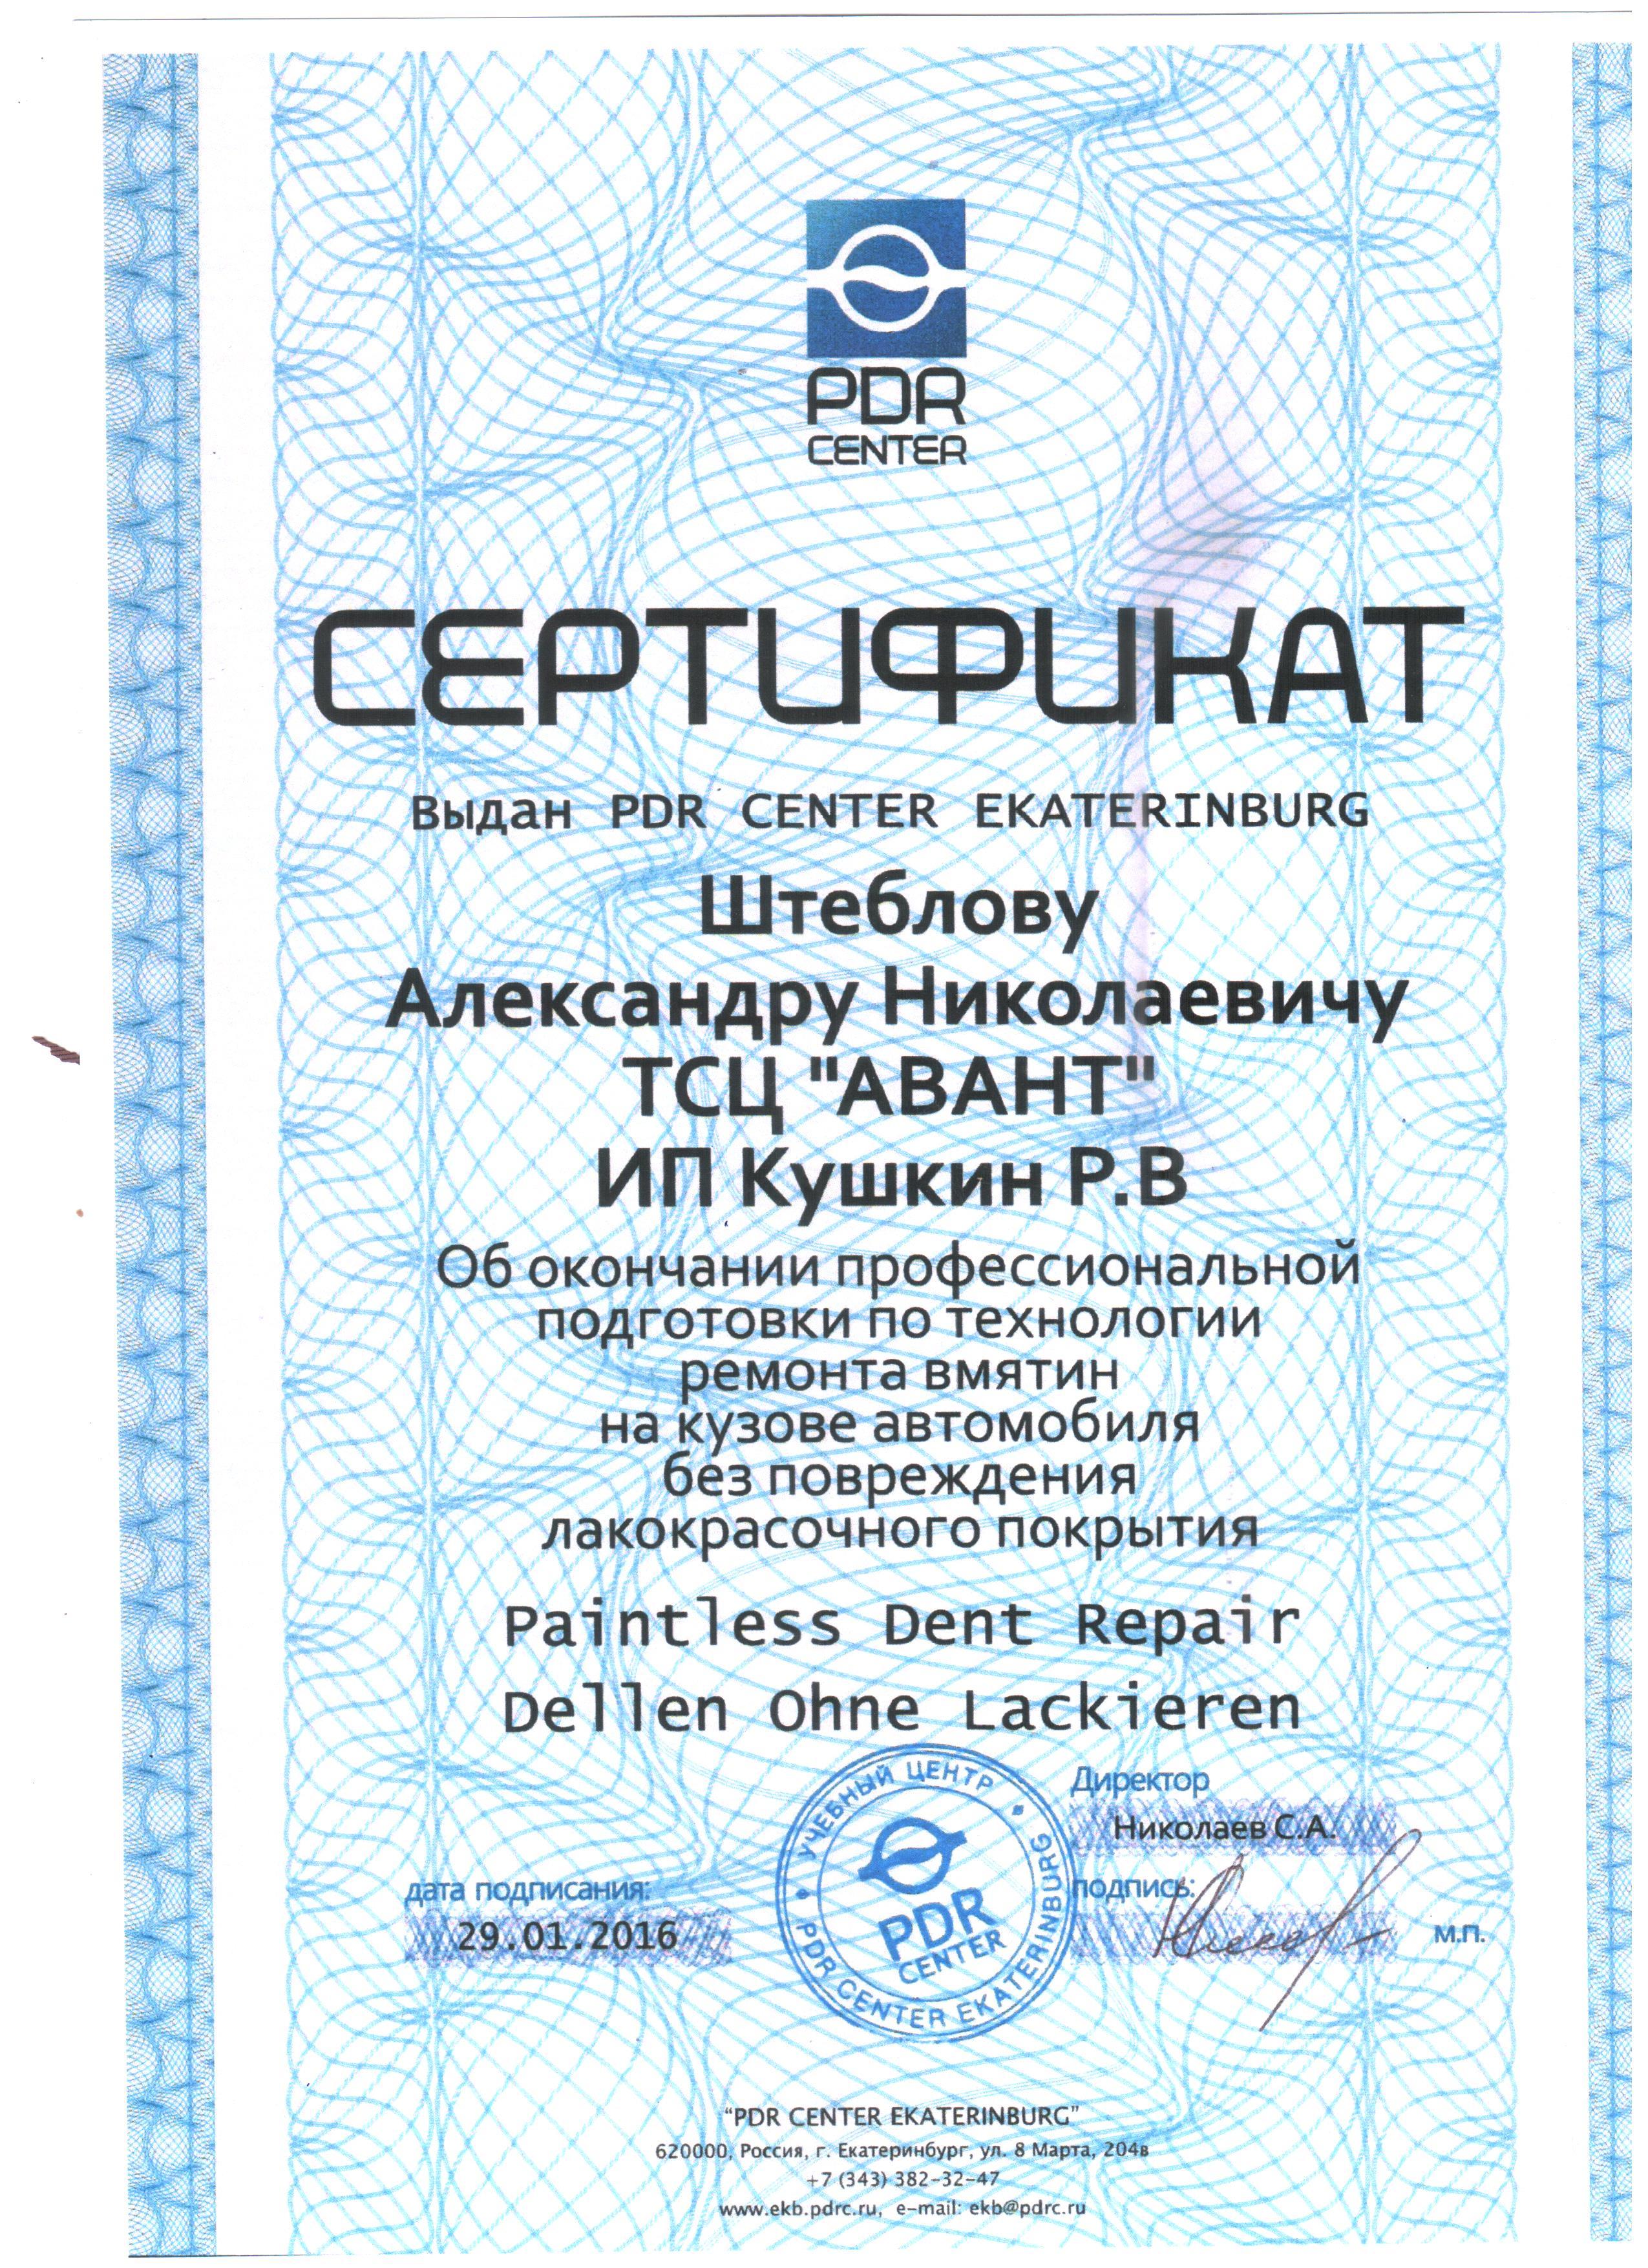 Удаление вмятин без покраски: Штеблов Александр